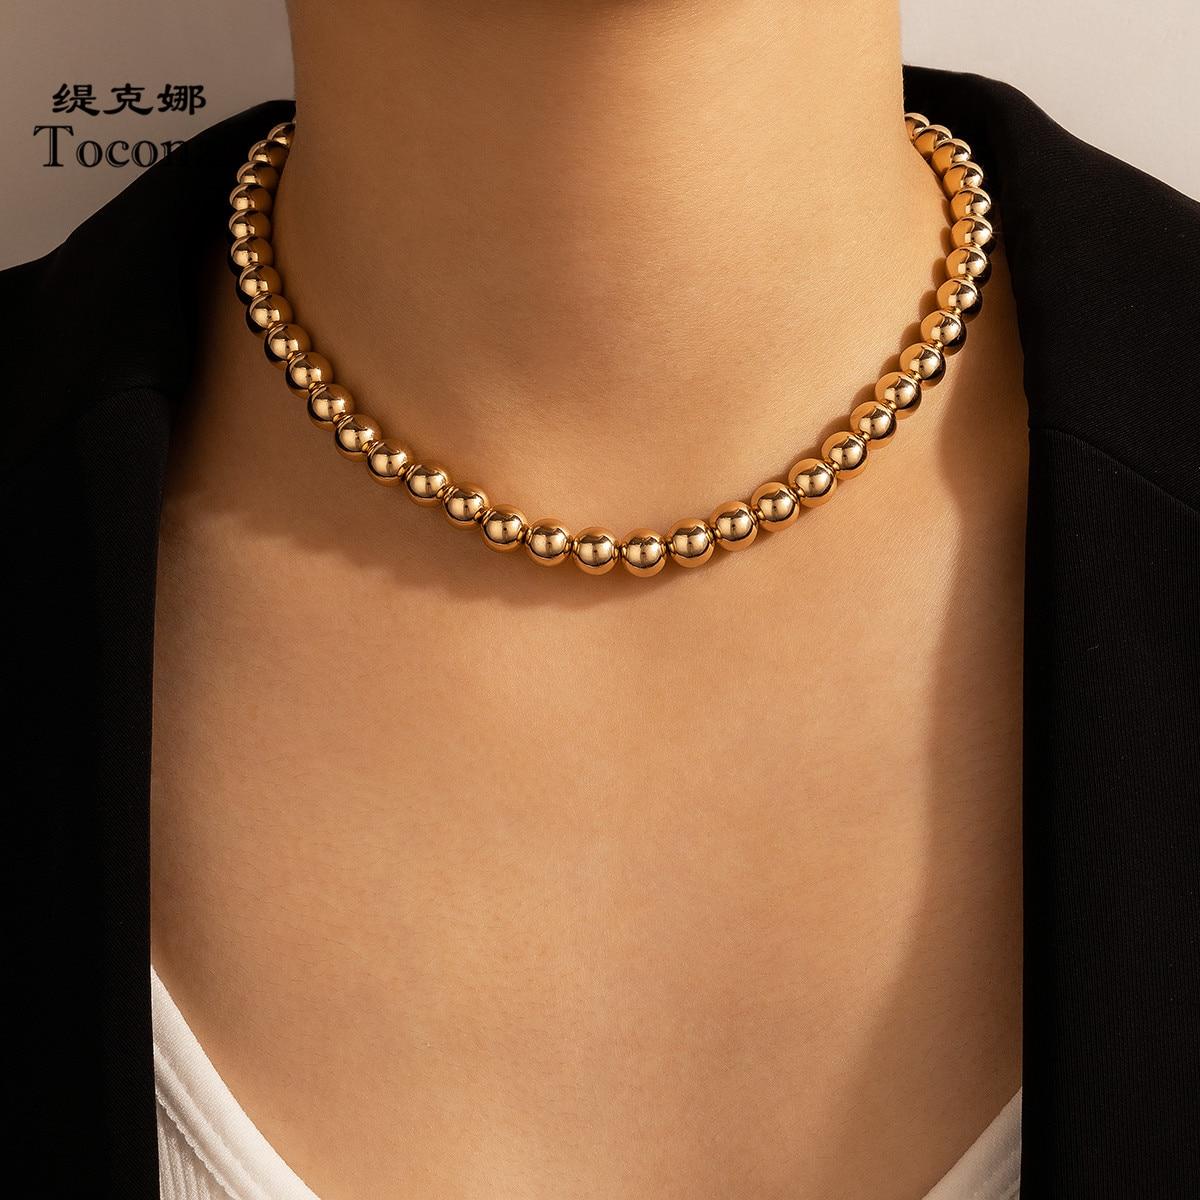 Tocona bohemain ouro cor grânulo corrente gargantilha neckalce para feminino charme liga metal festa jóias acessórios colar 16956